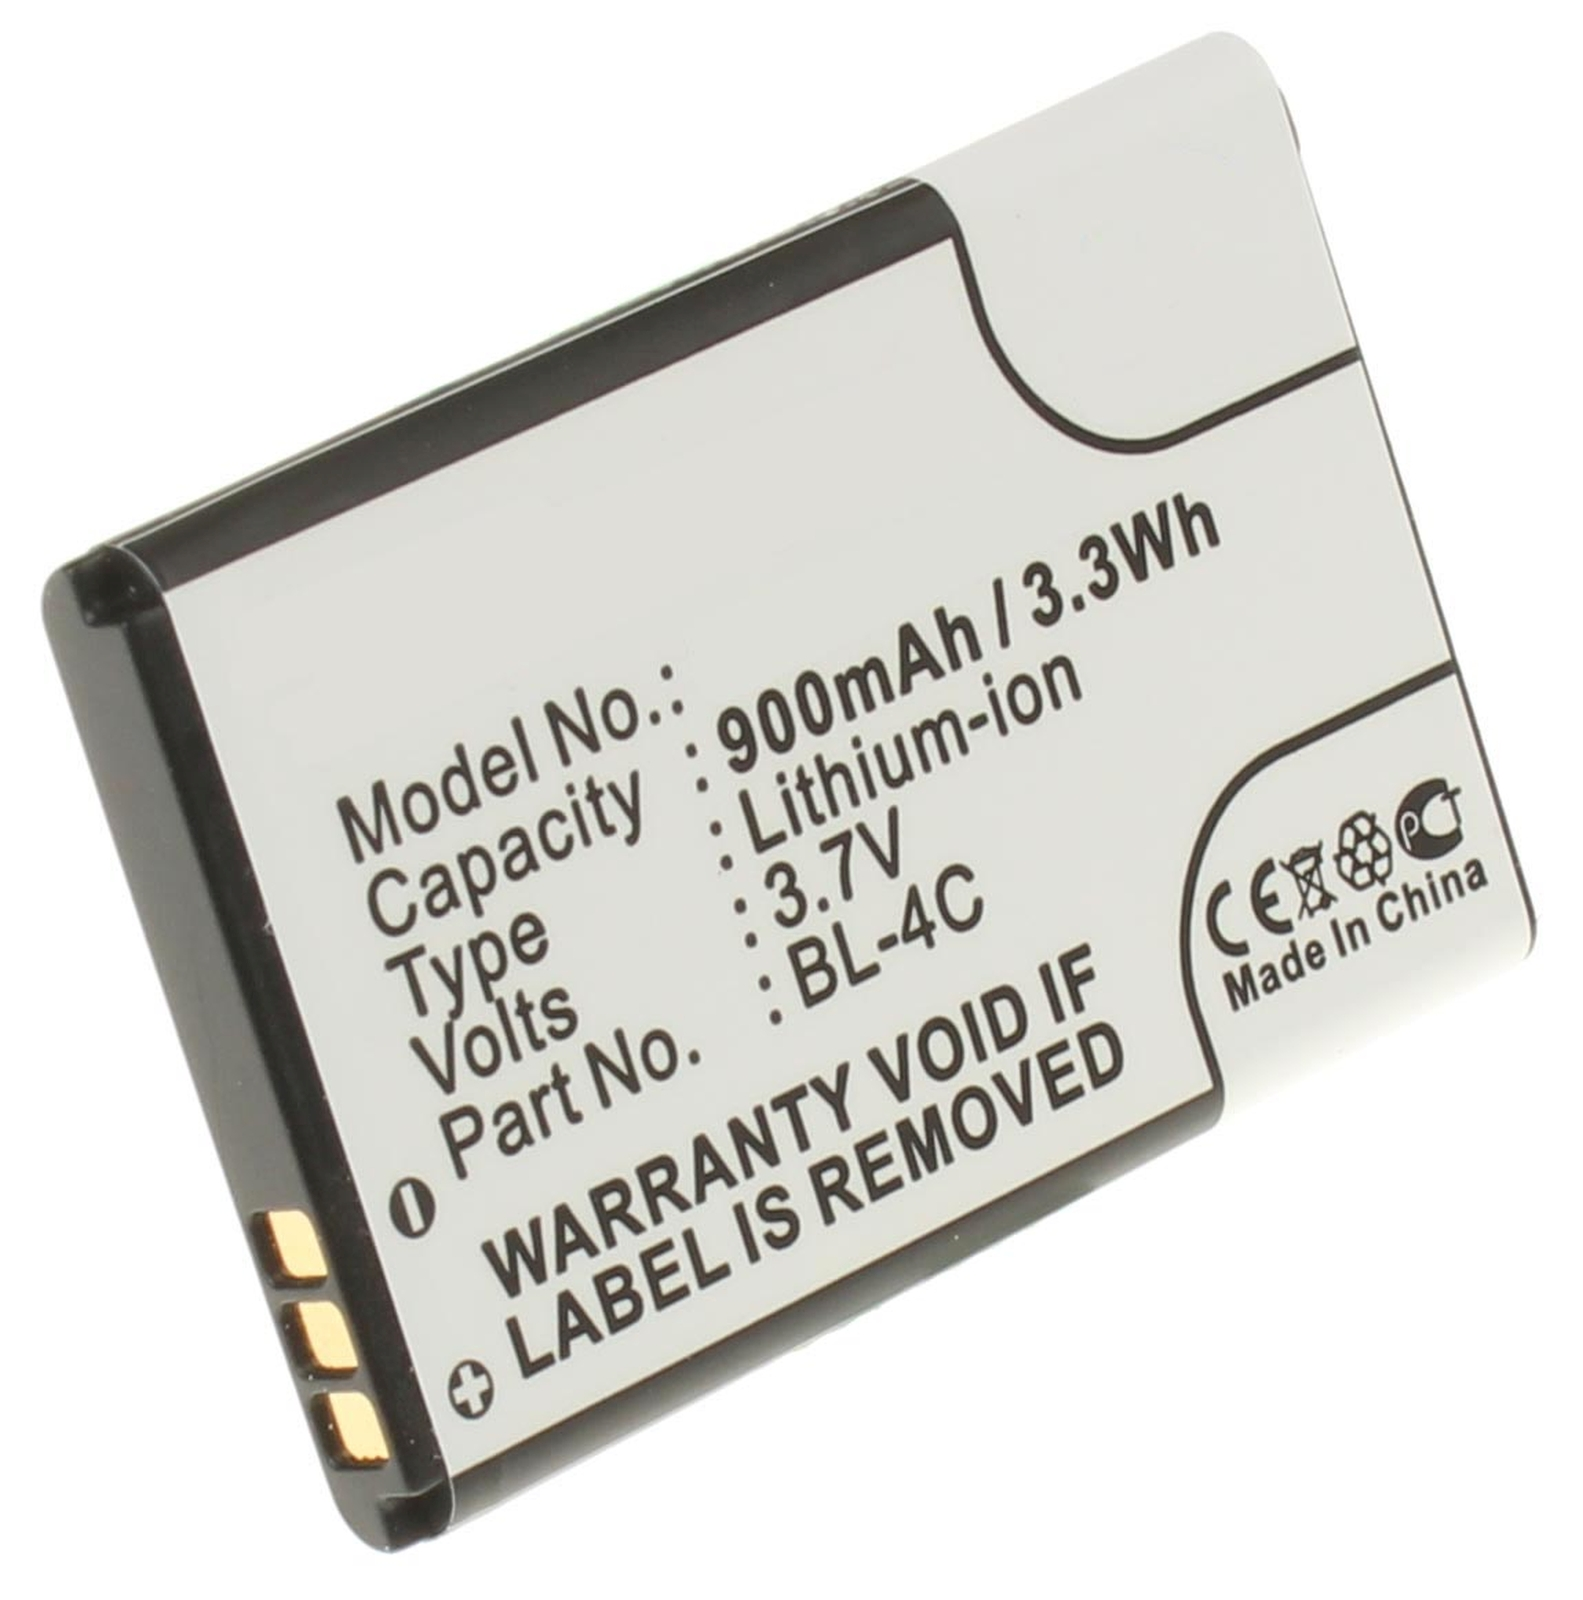 BL-4C  – Купить аккумулятор (батарею) для телефонов, смартфонов Nokia. Артикул iB-M348